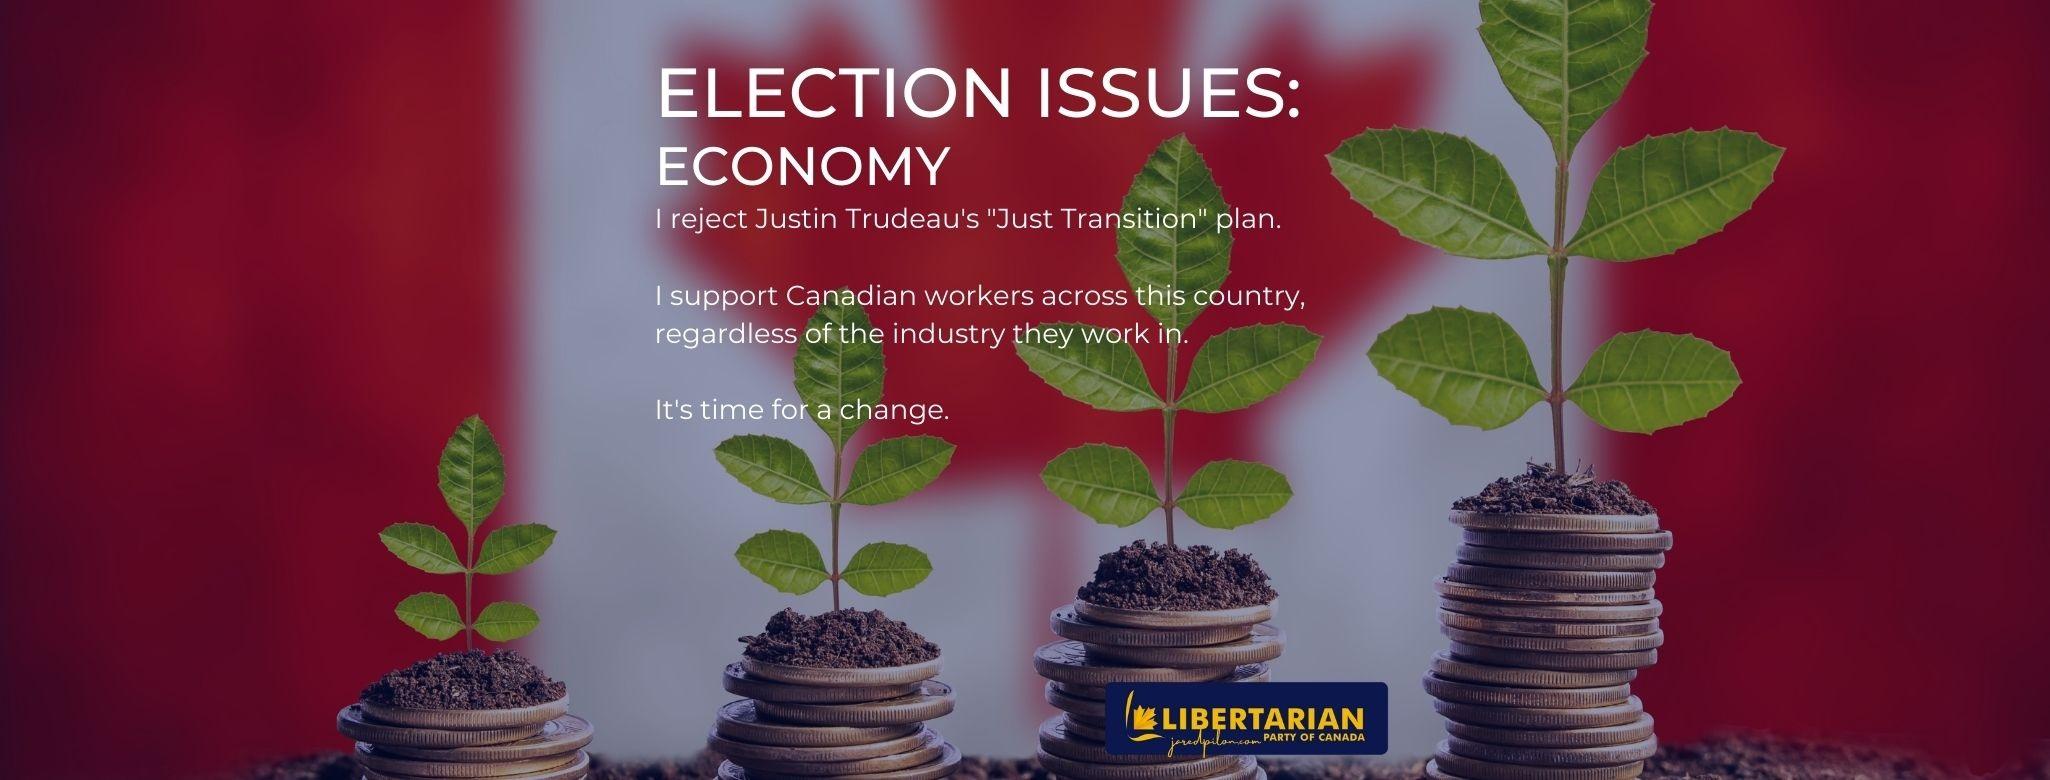 Election Issues - Economy